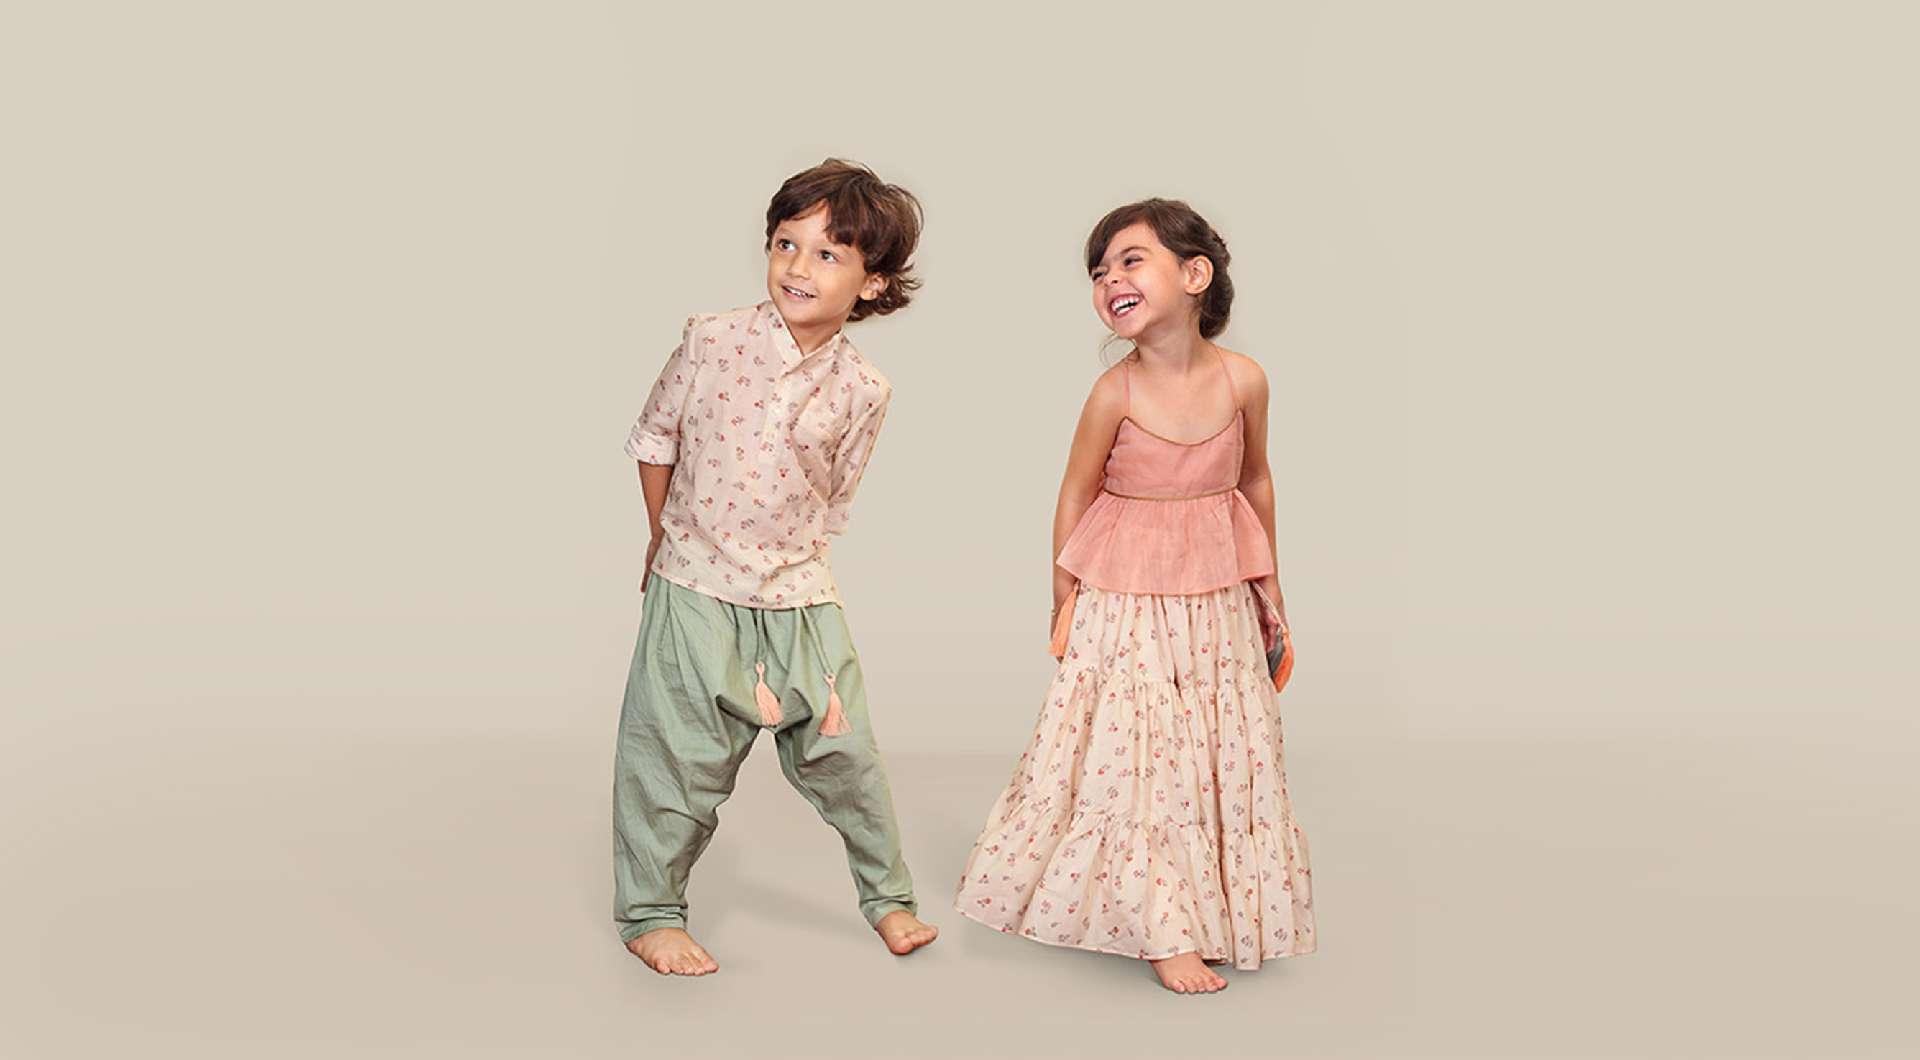 Festive collection - Kurta & Lehenga Set for Boys and Girls